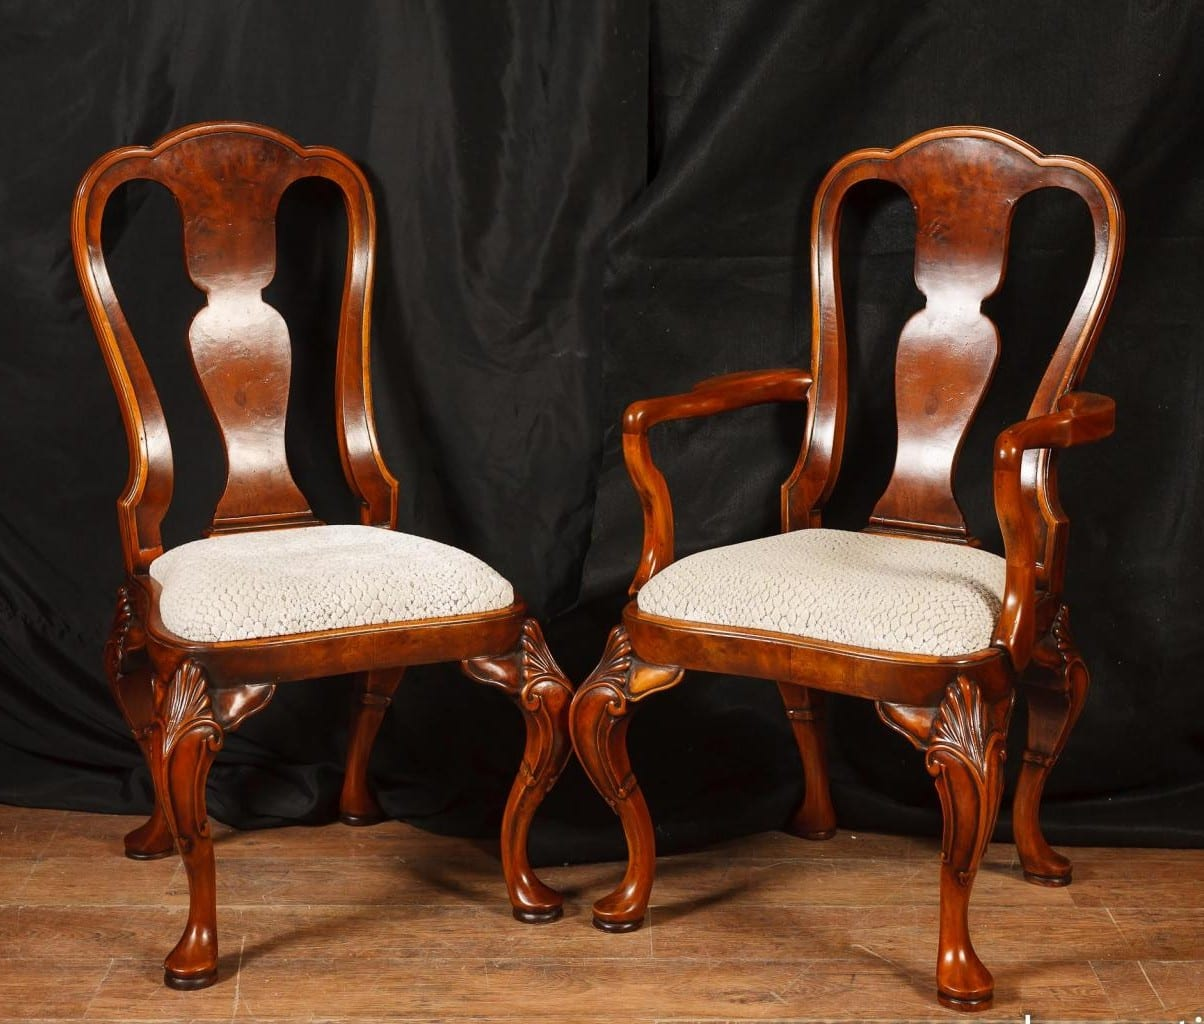 Iconic Antique Chair Design Part 1